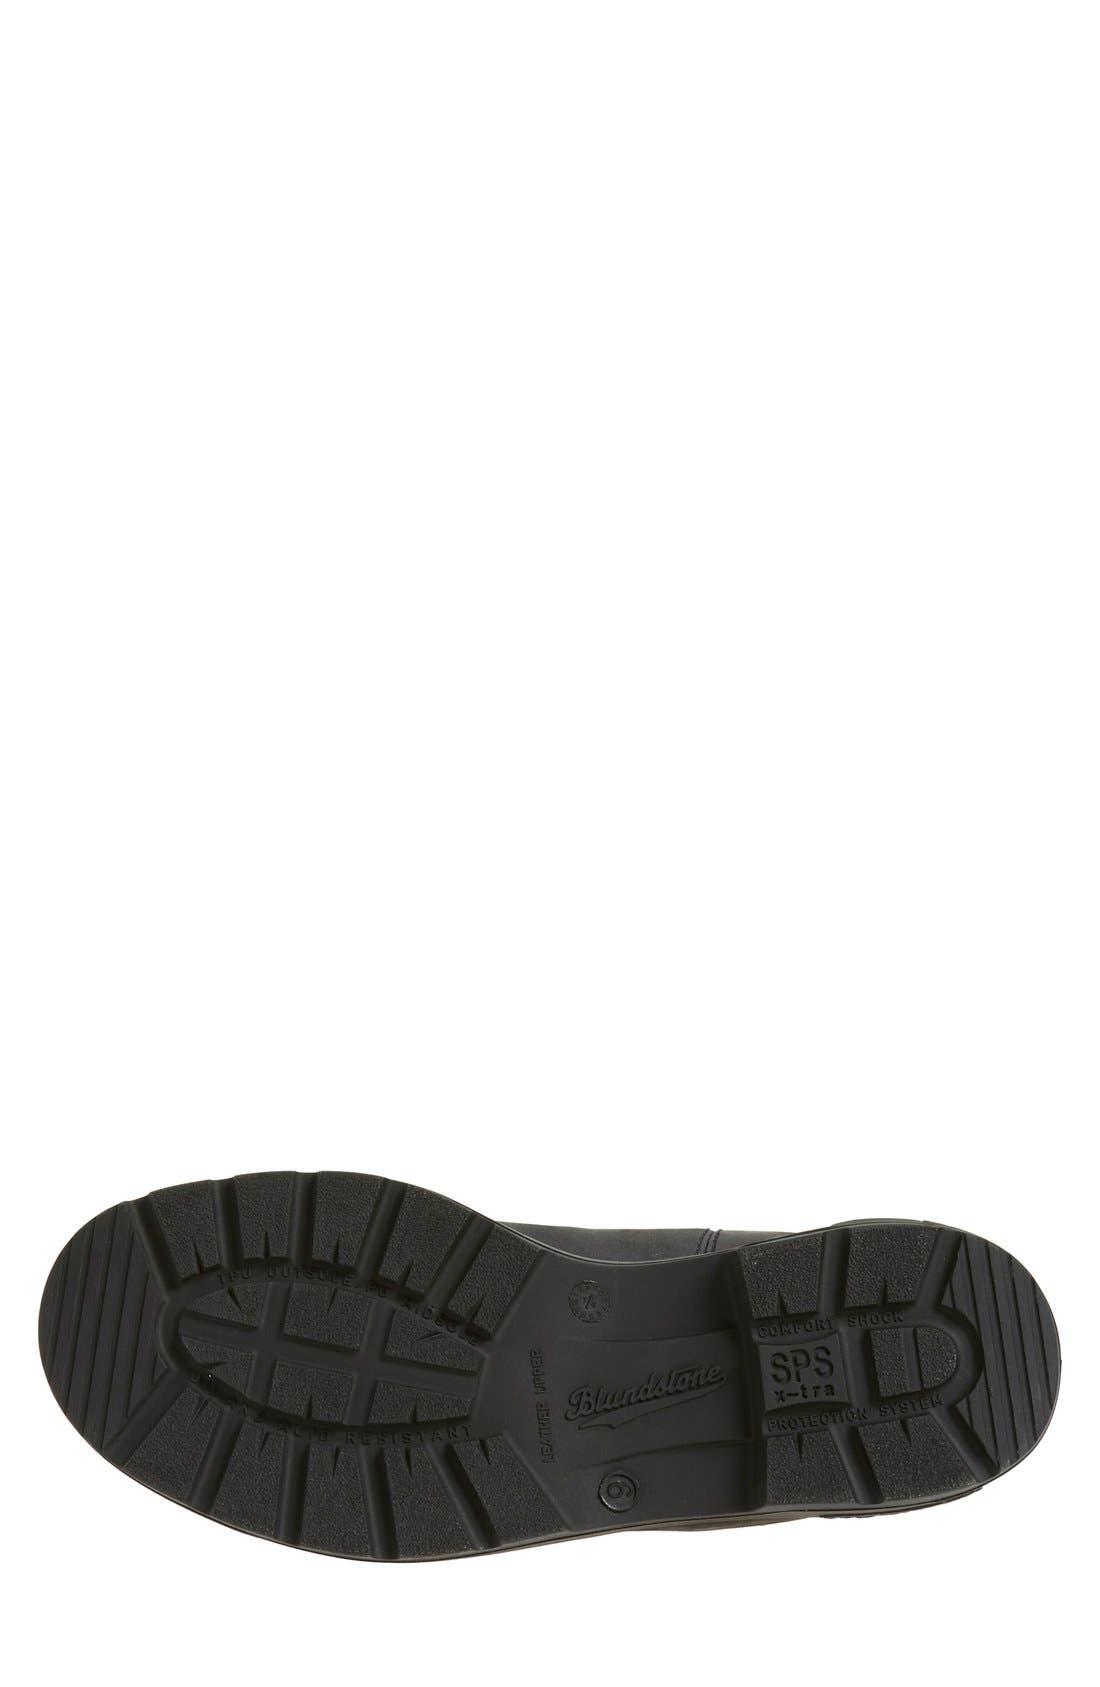 Footwear Chelsea Boot,                             Alternate thumbnail 6, color,                             RUSTIC BLACK